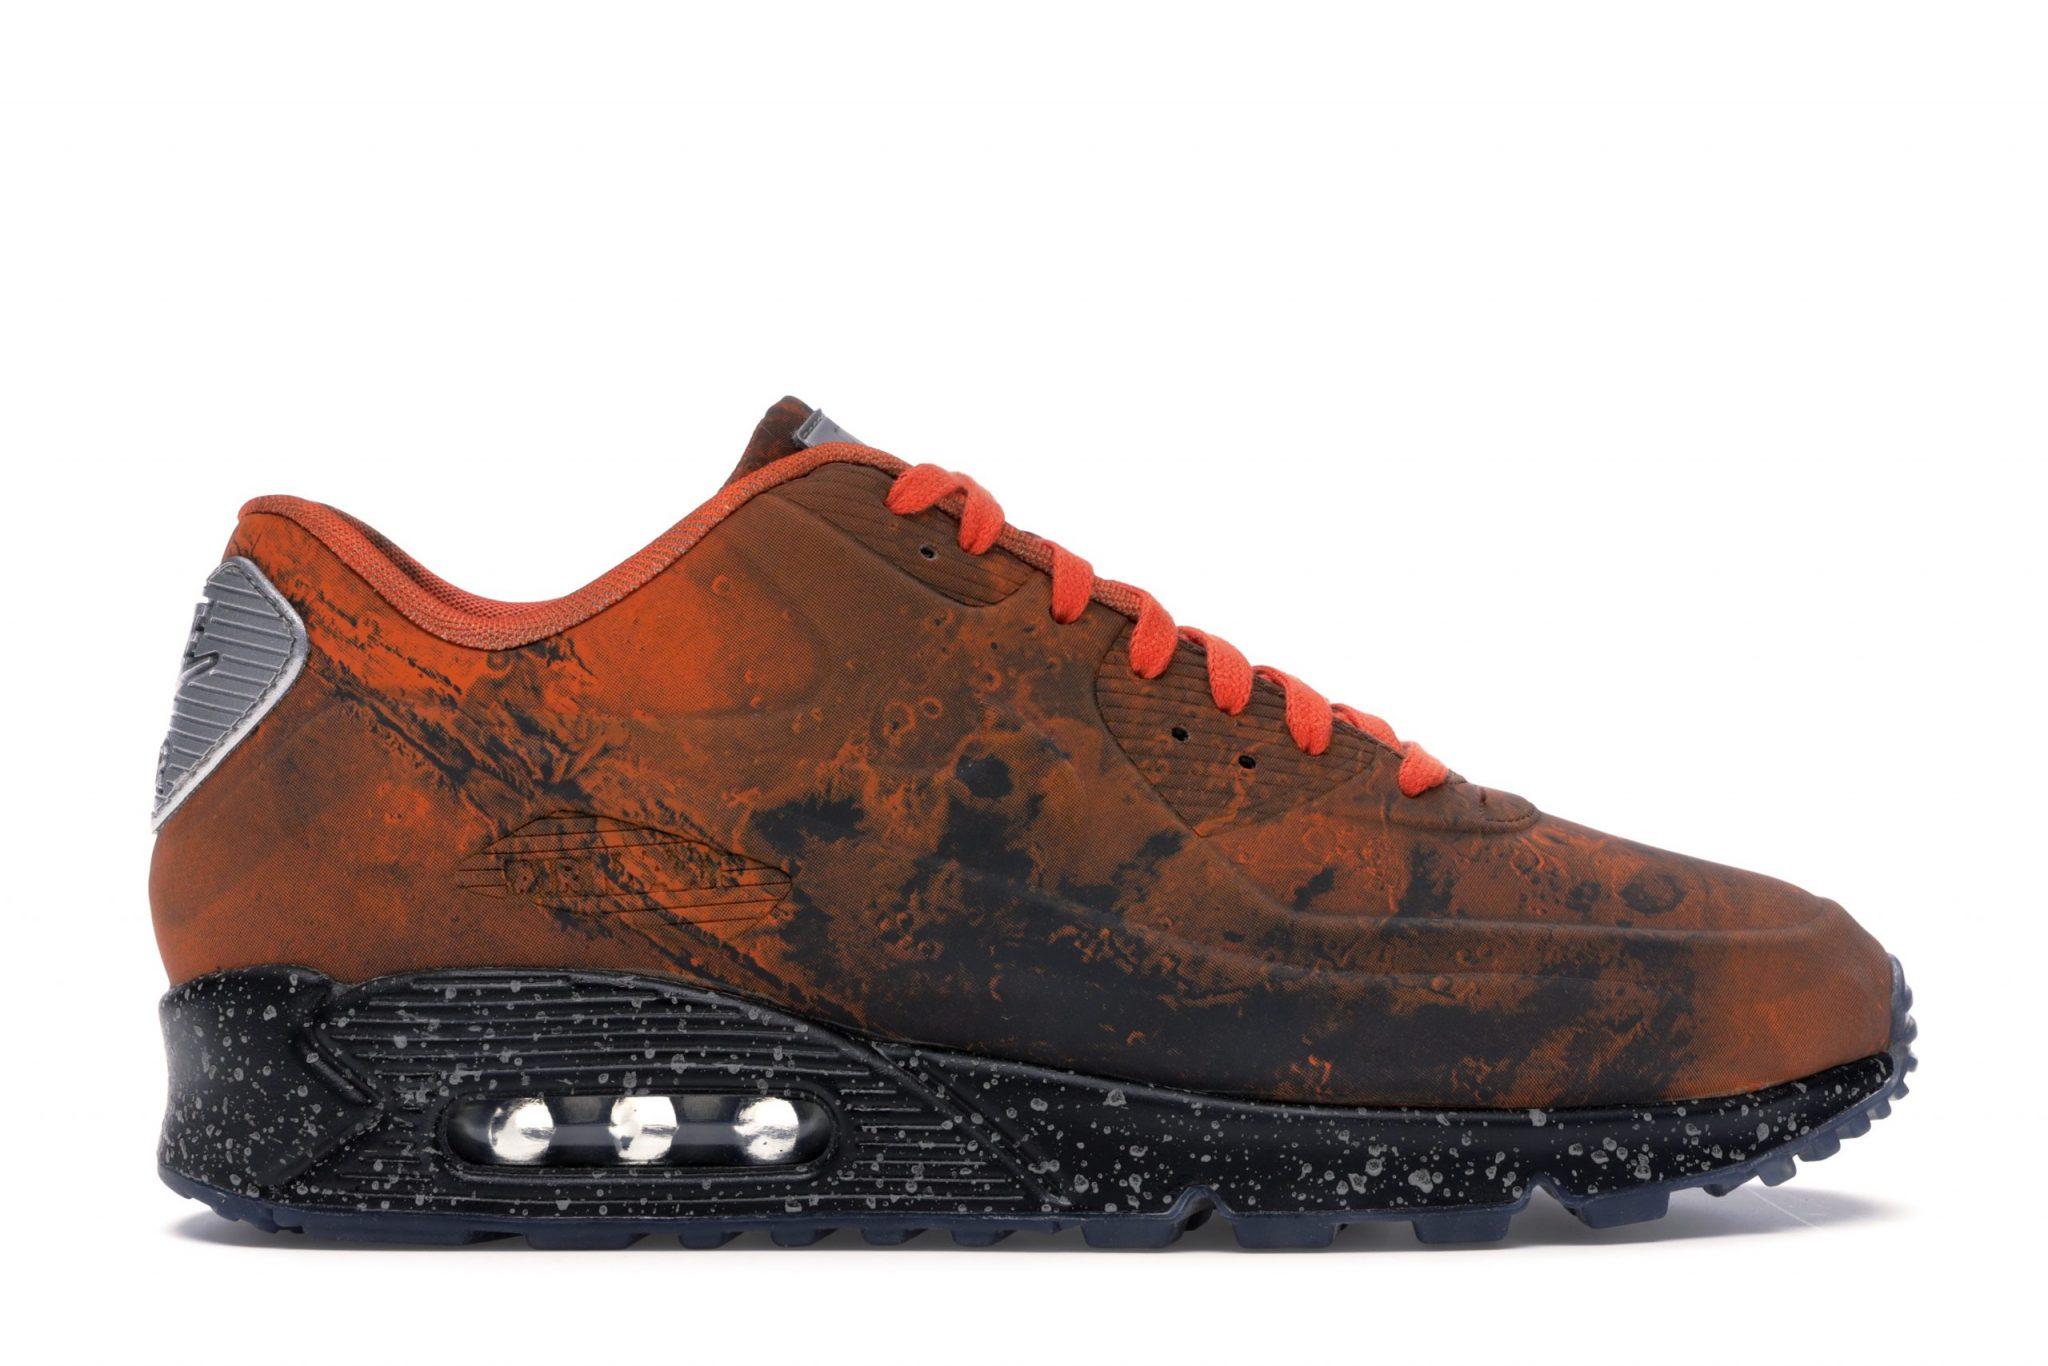 Nike-Air-Max-90-Mars-Landing_01